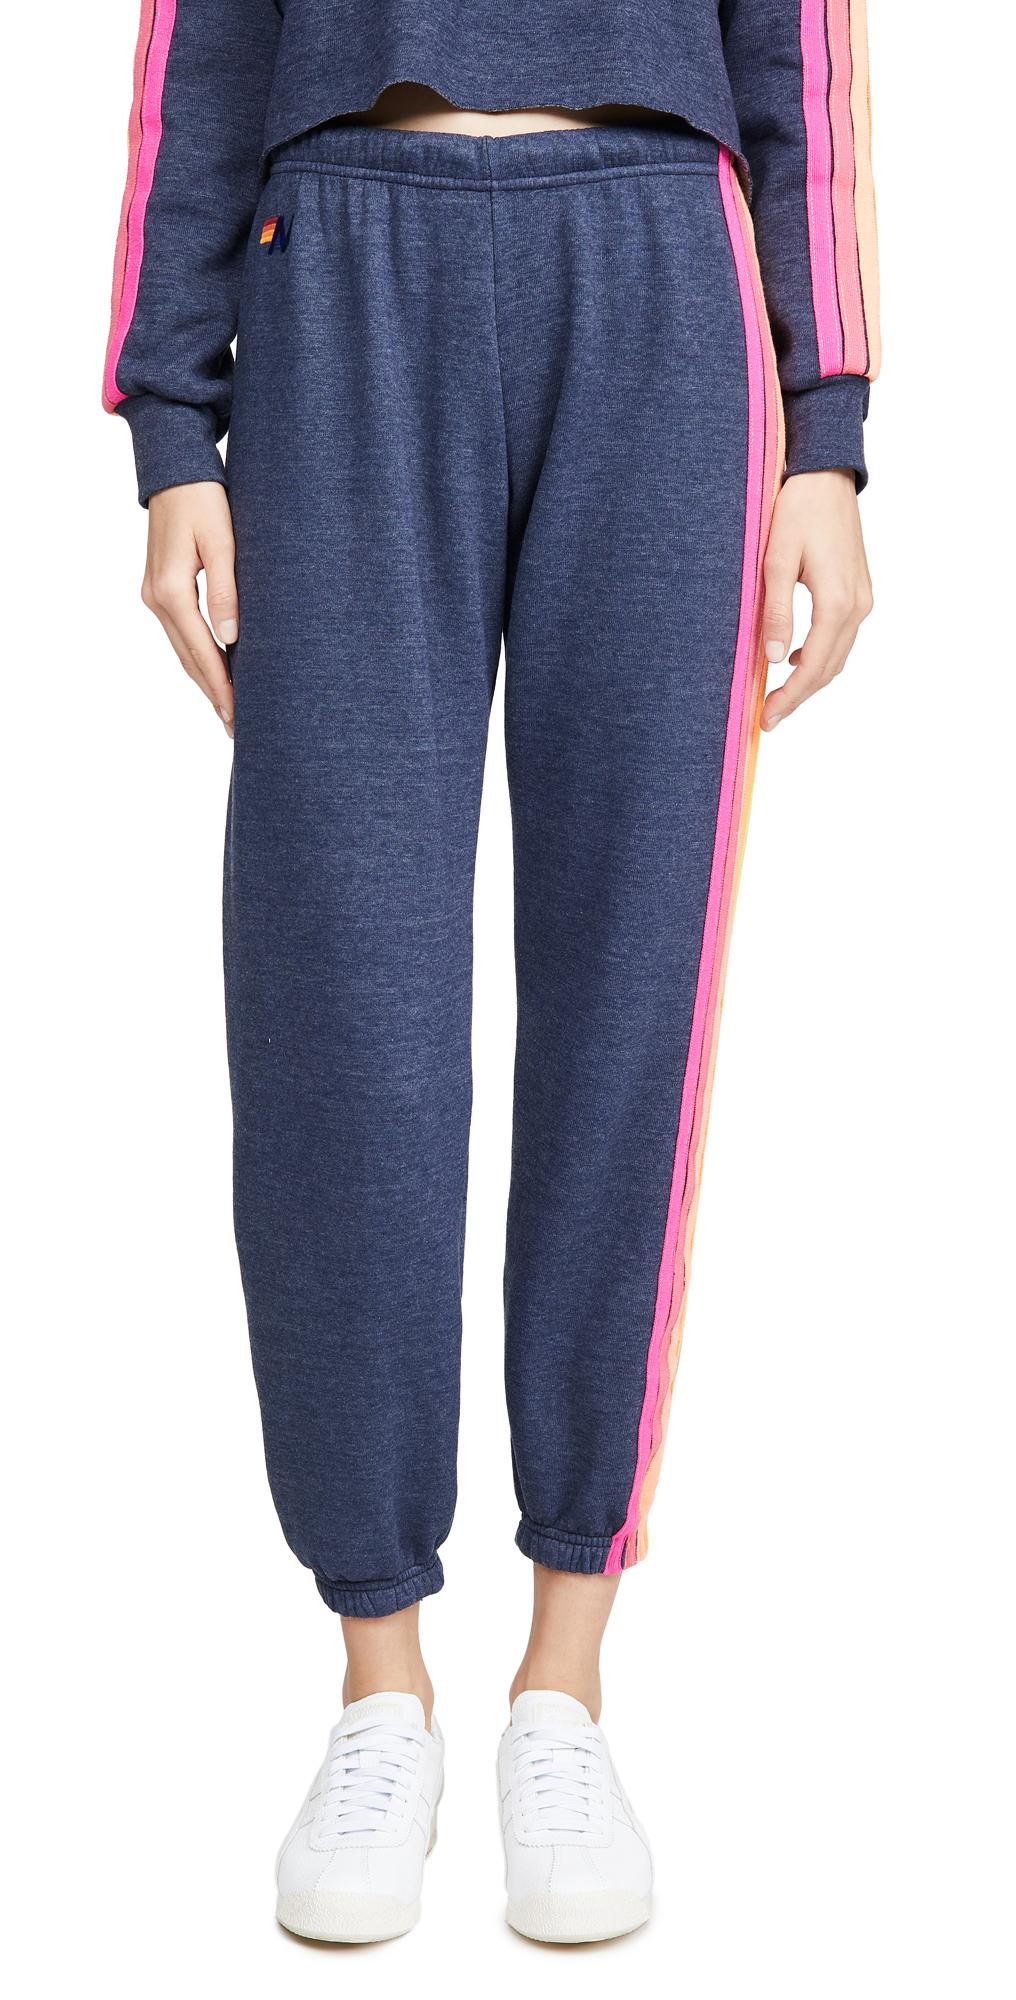 5 Stripe Sweatpants